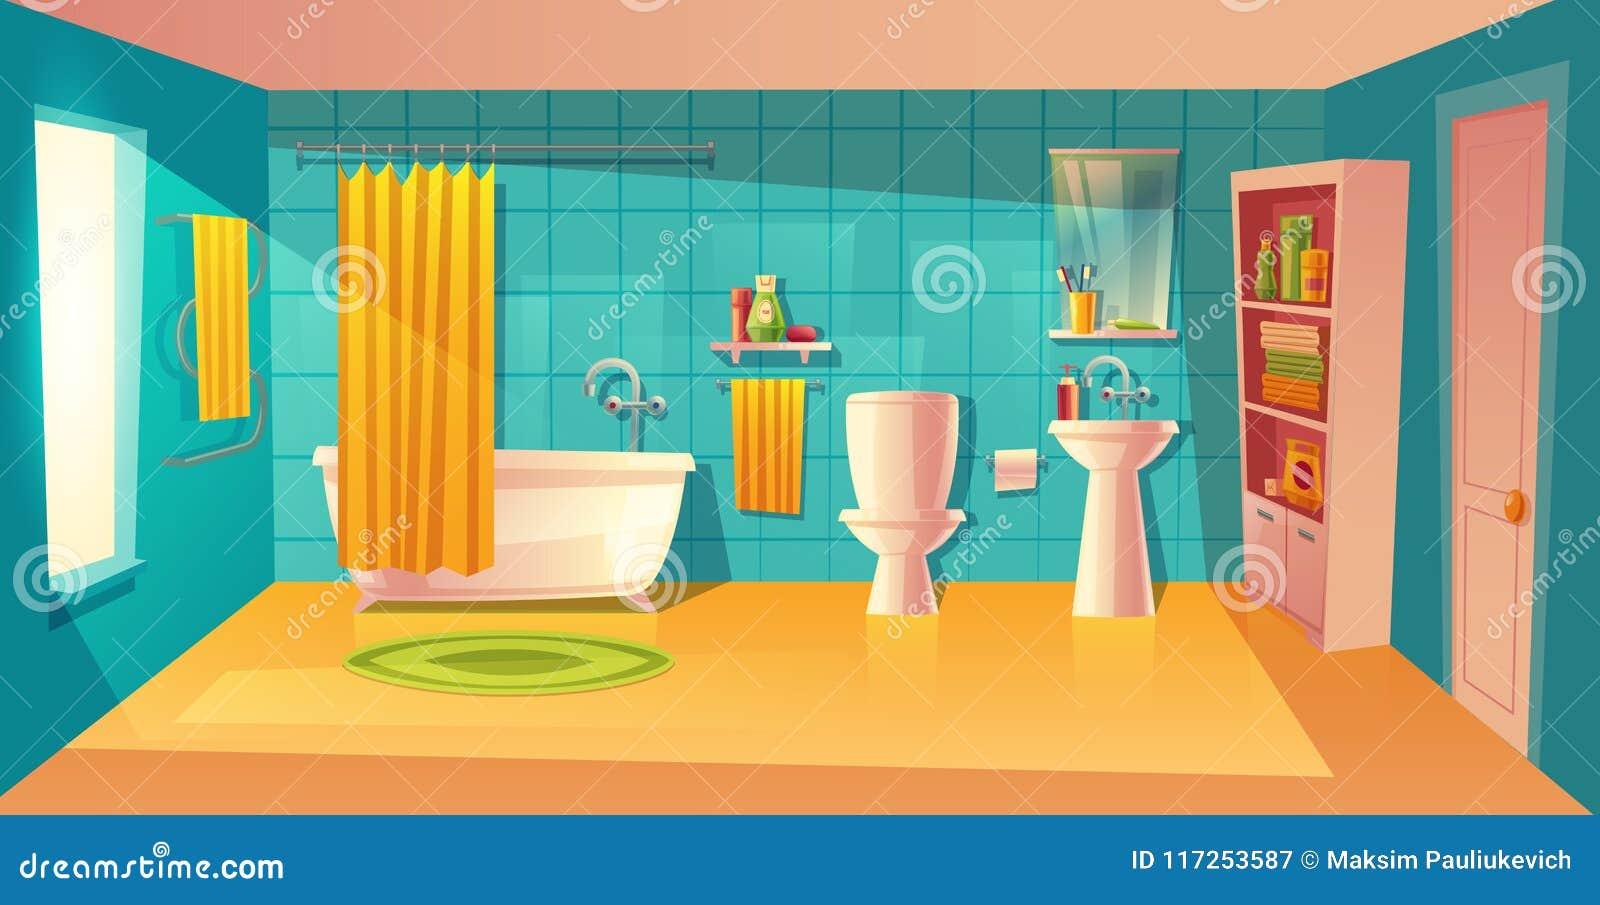 Bathroom Stock Illustrations – 11,11 Bathroom Stock